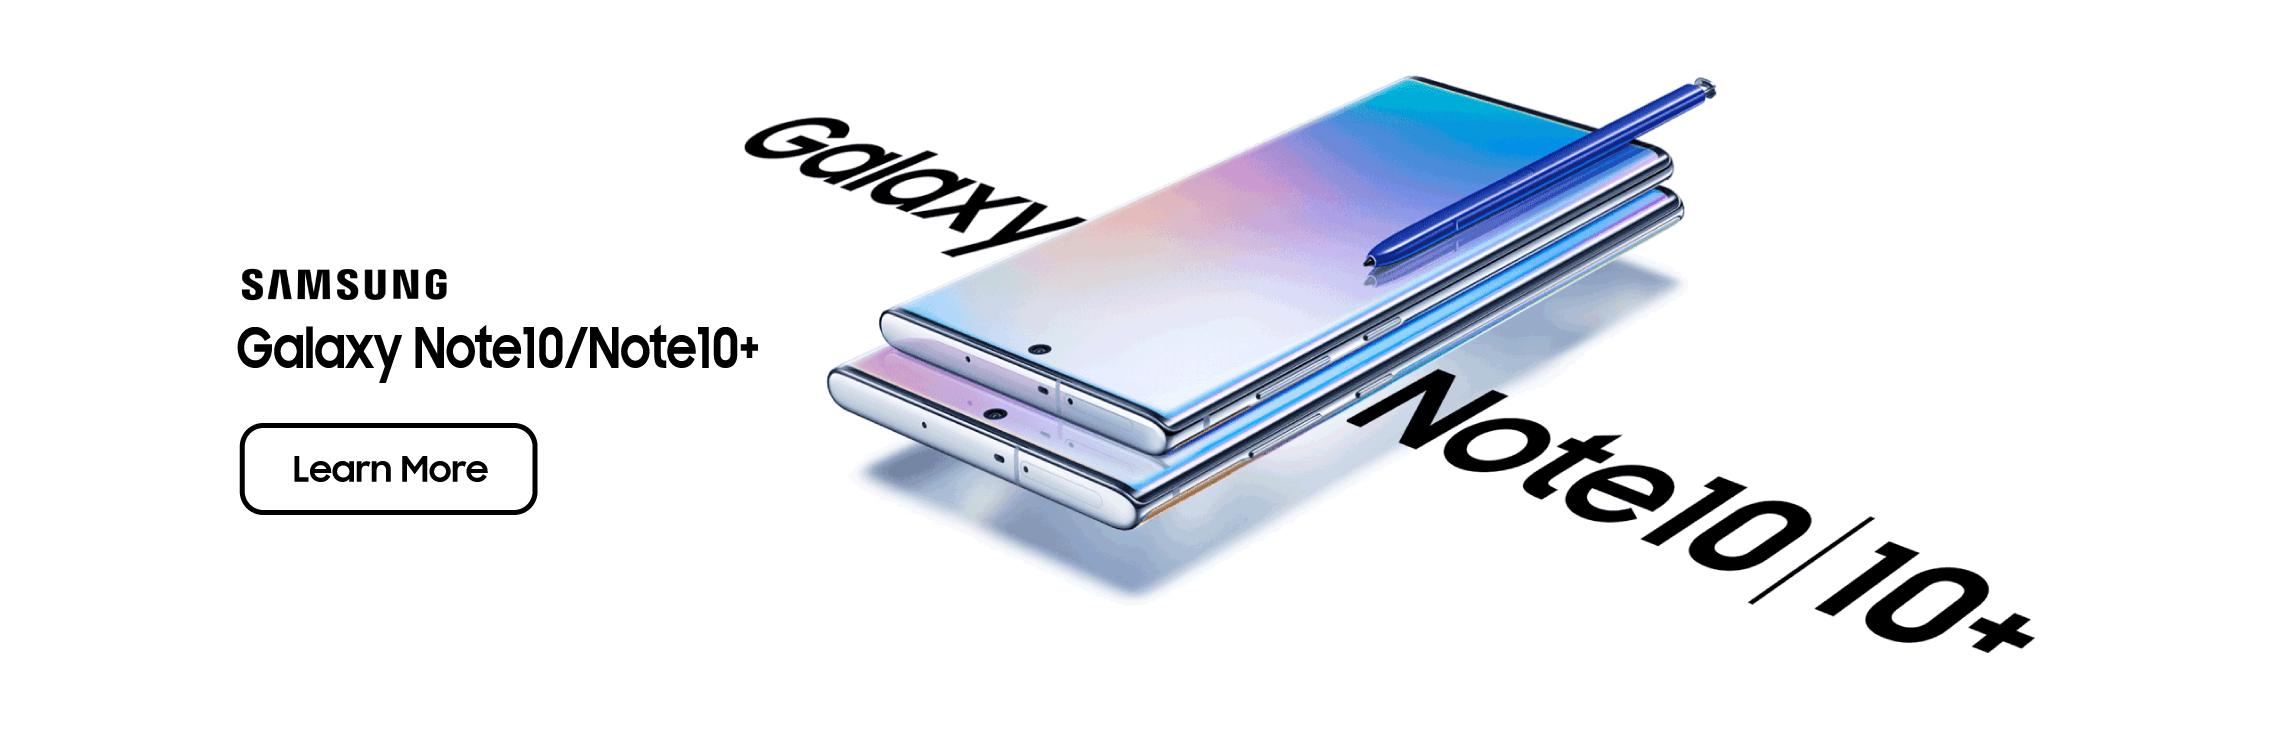 Samsung Galaxy Note10/Note10+